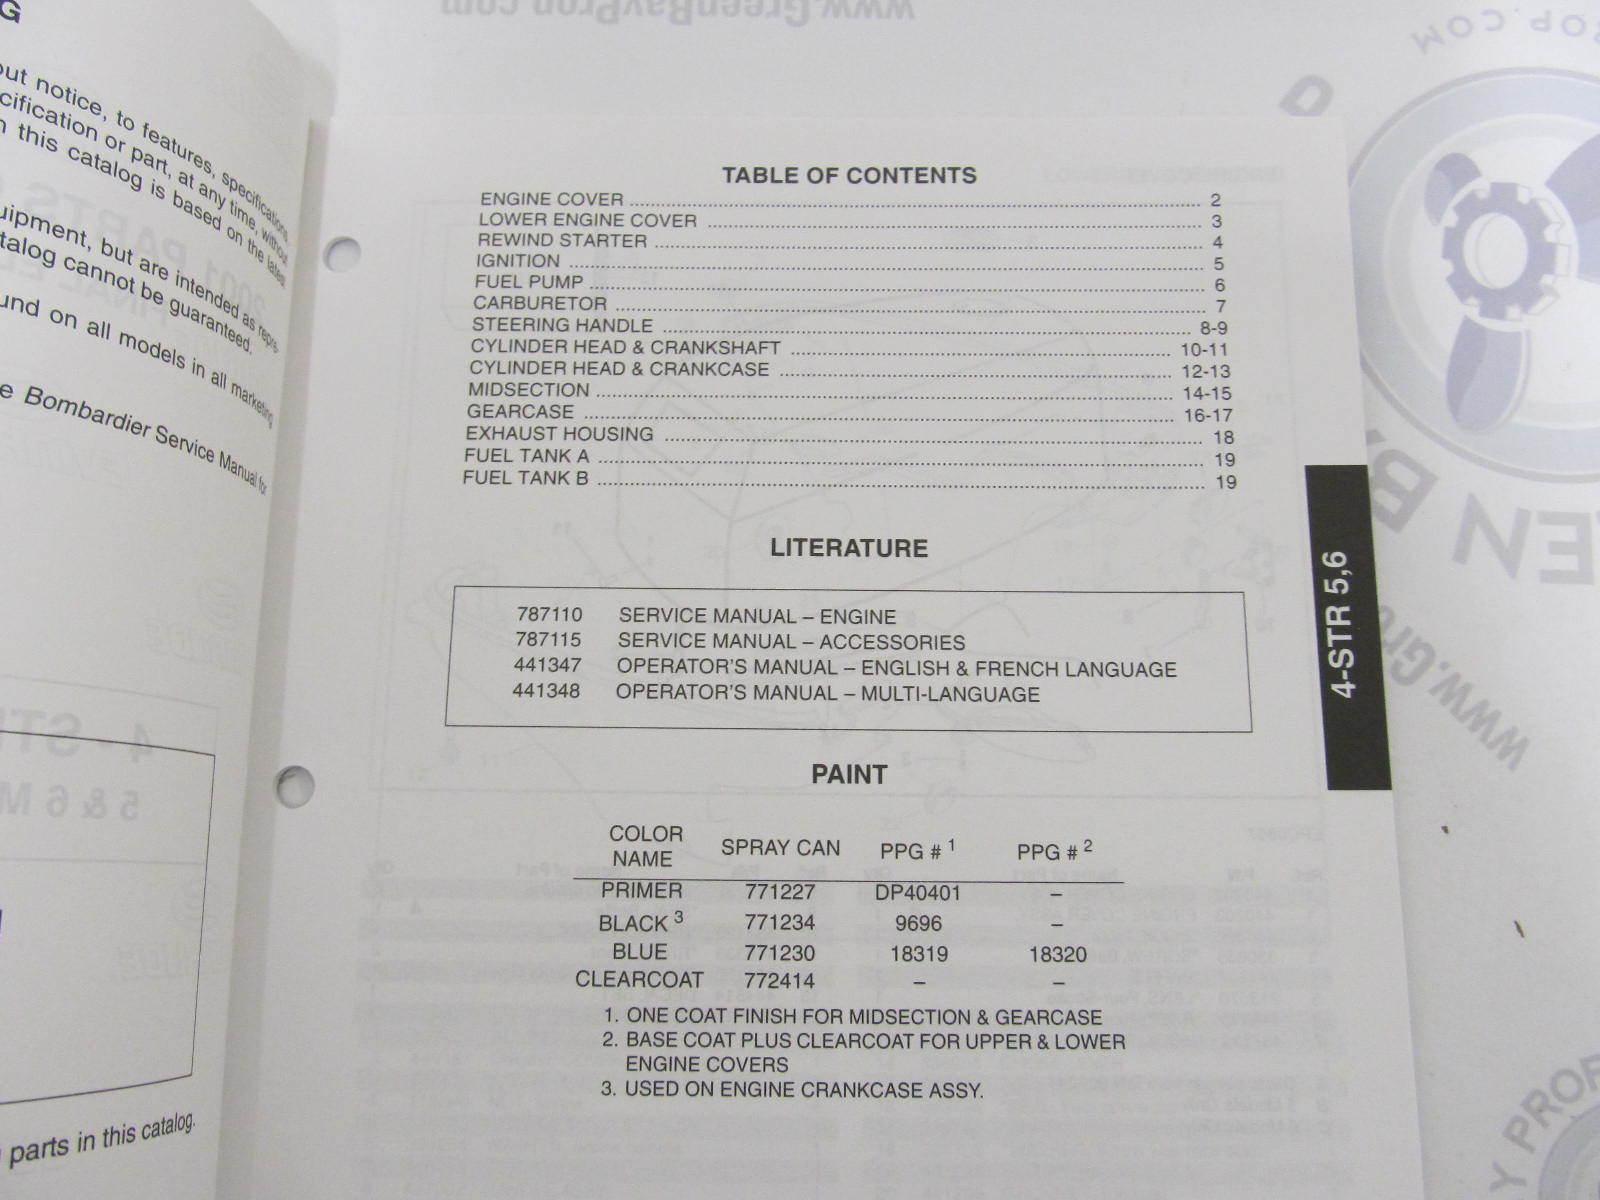 5001661 OMC BRP Evinrude 5-6 HP 4-Stroke Outboard Parts Catalog 2001